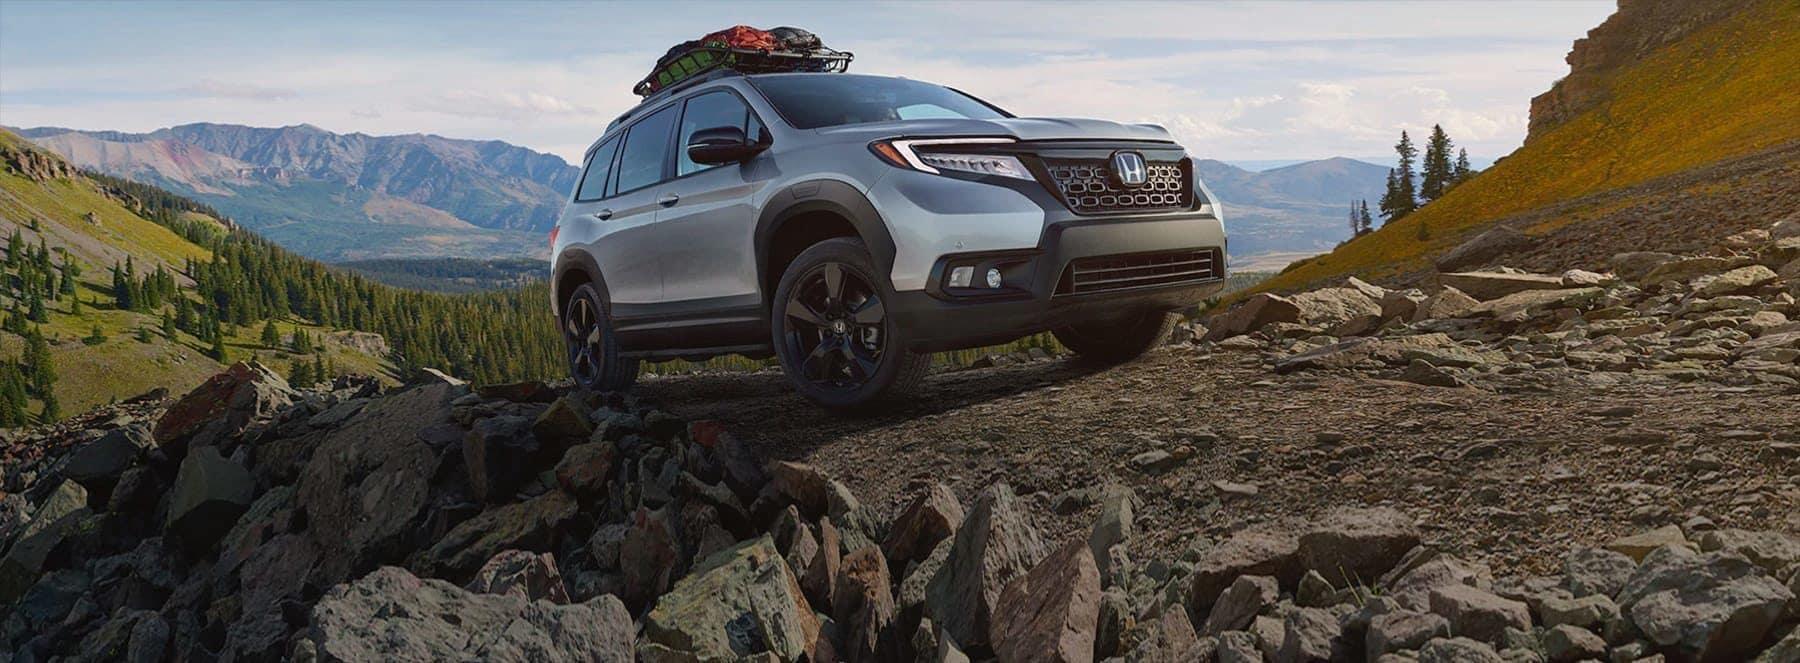 Honda driving through mountains